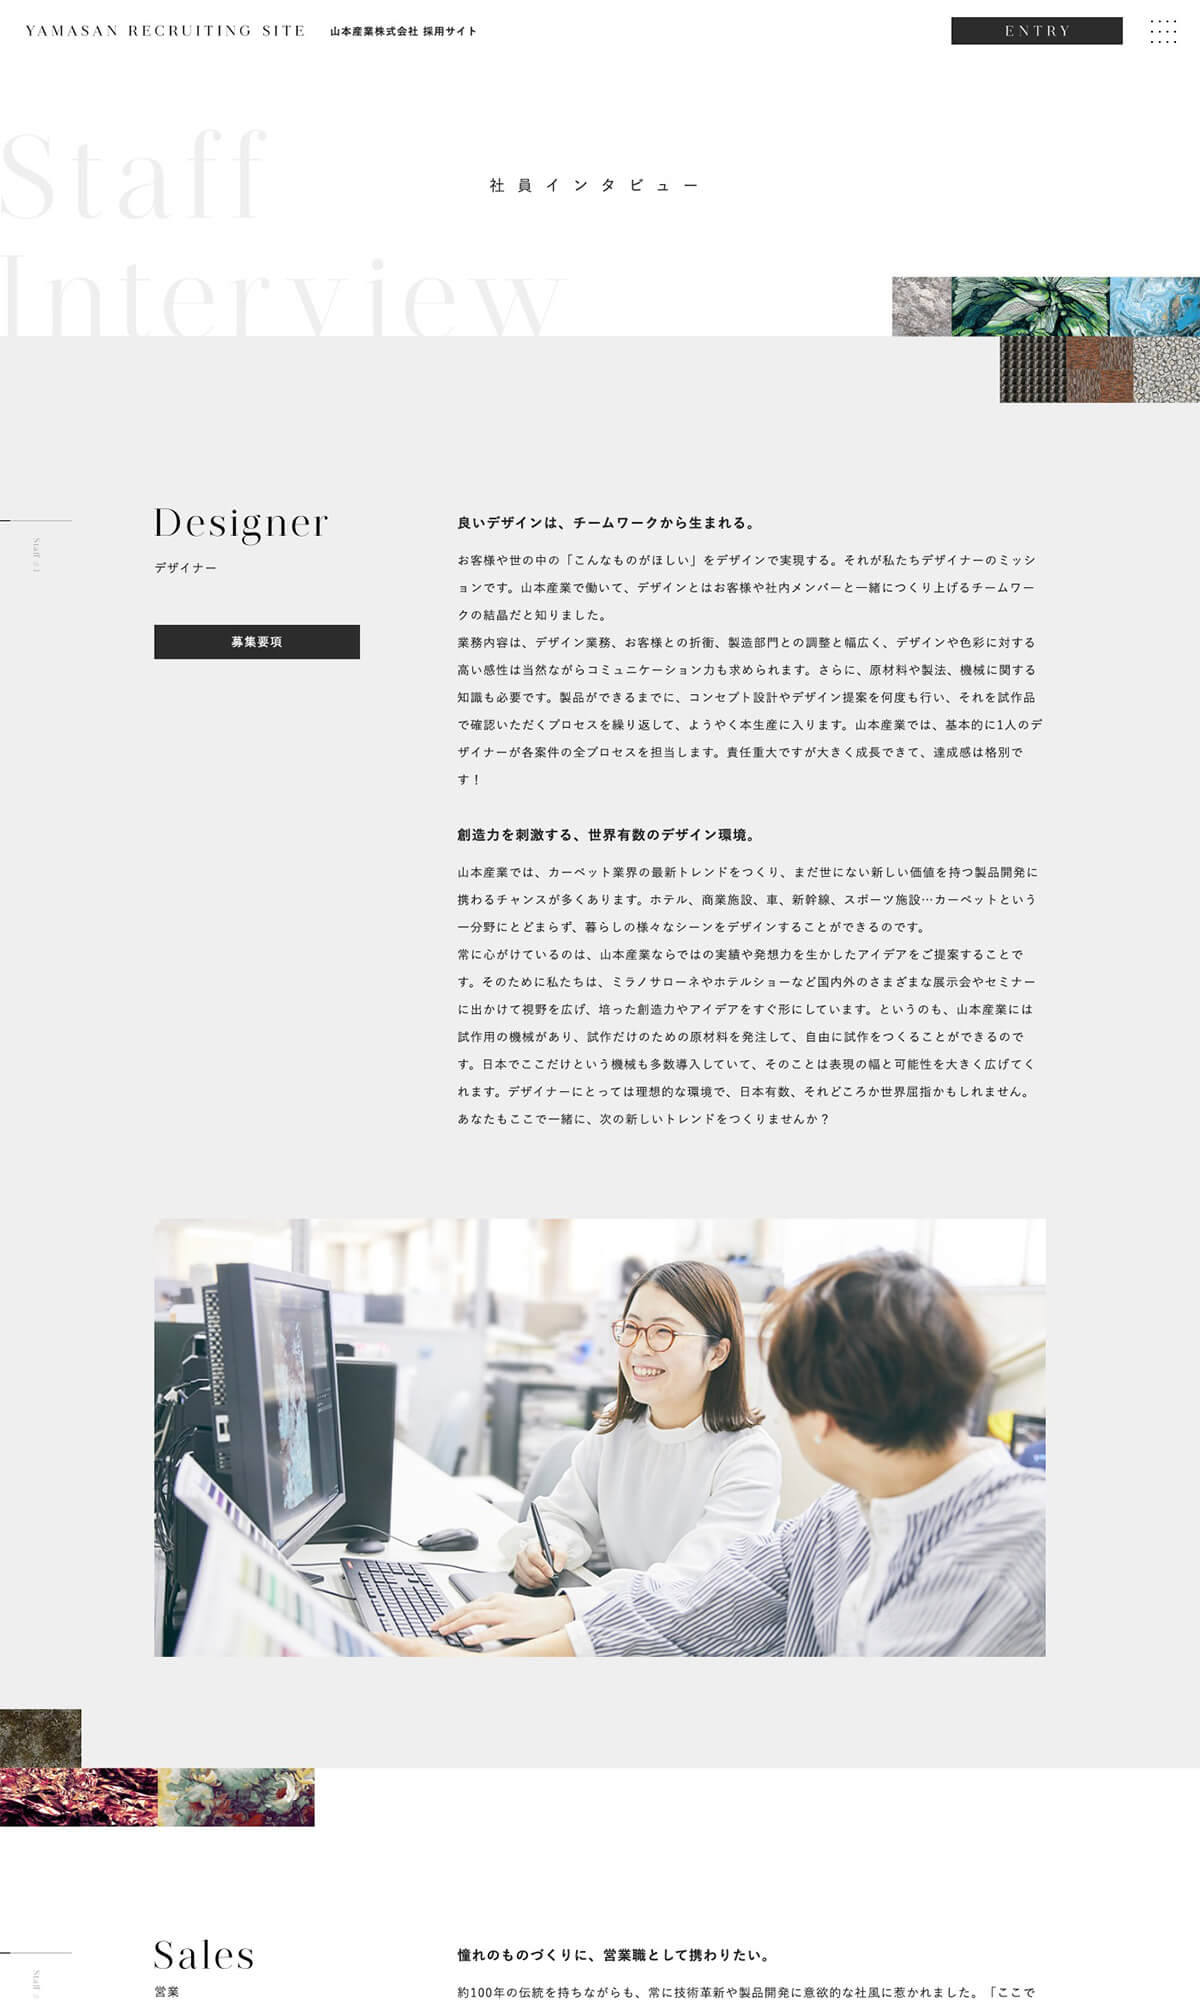 山本産業株式会社 採用サイト